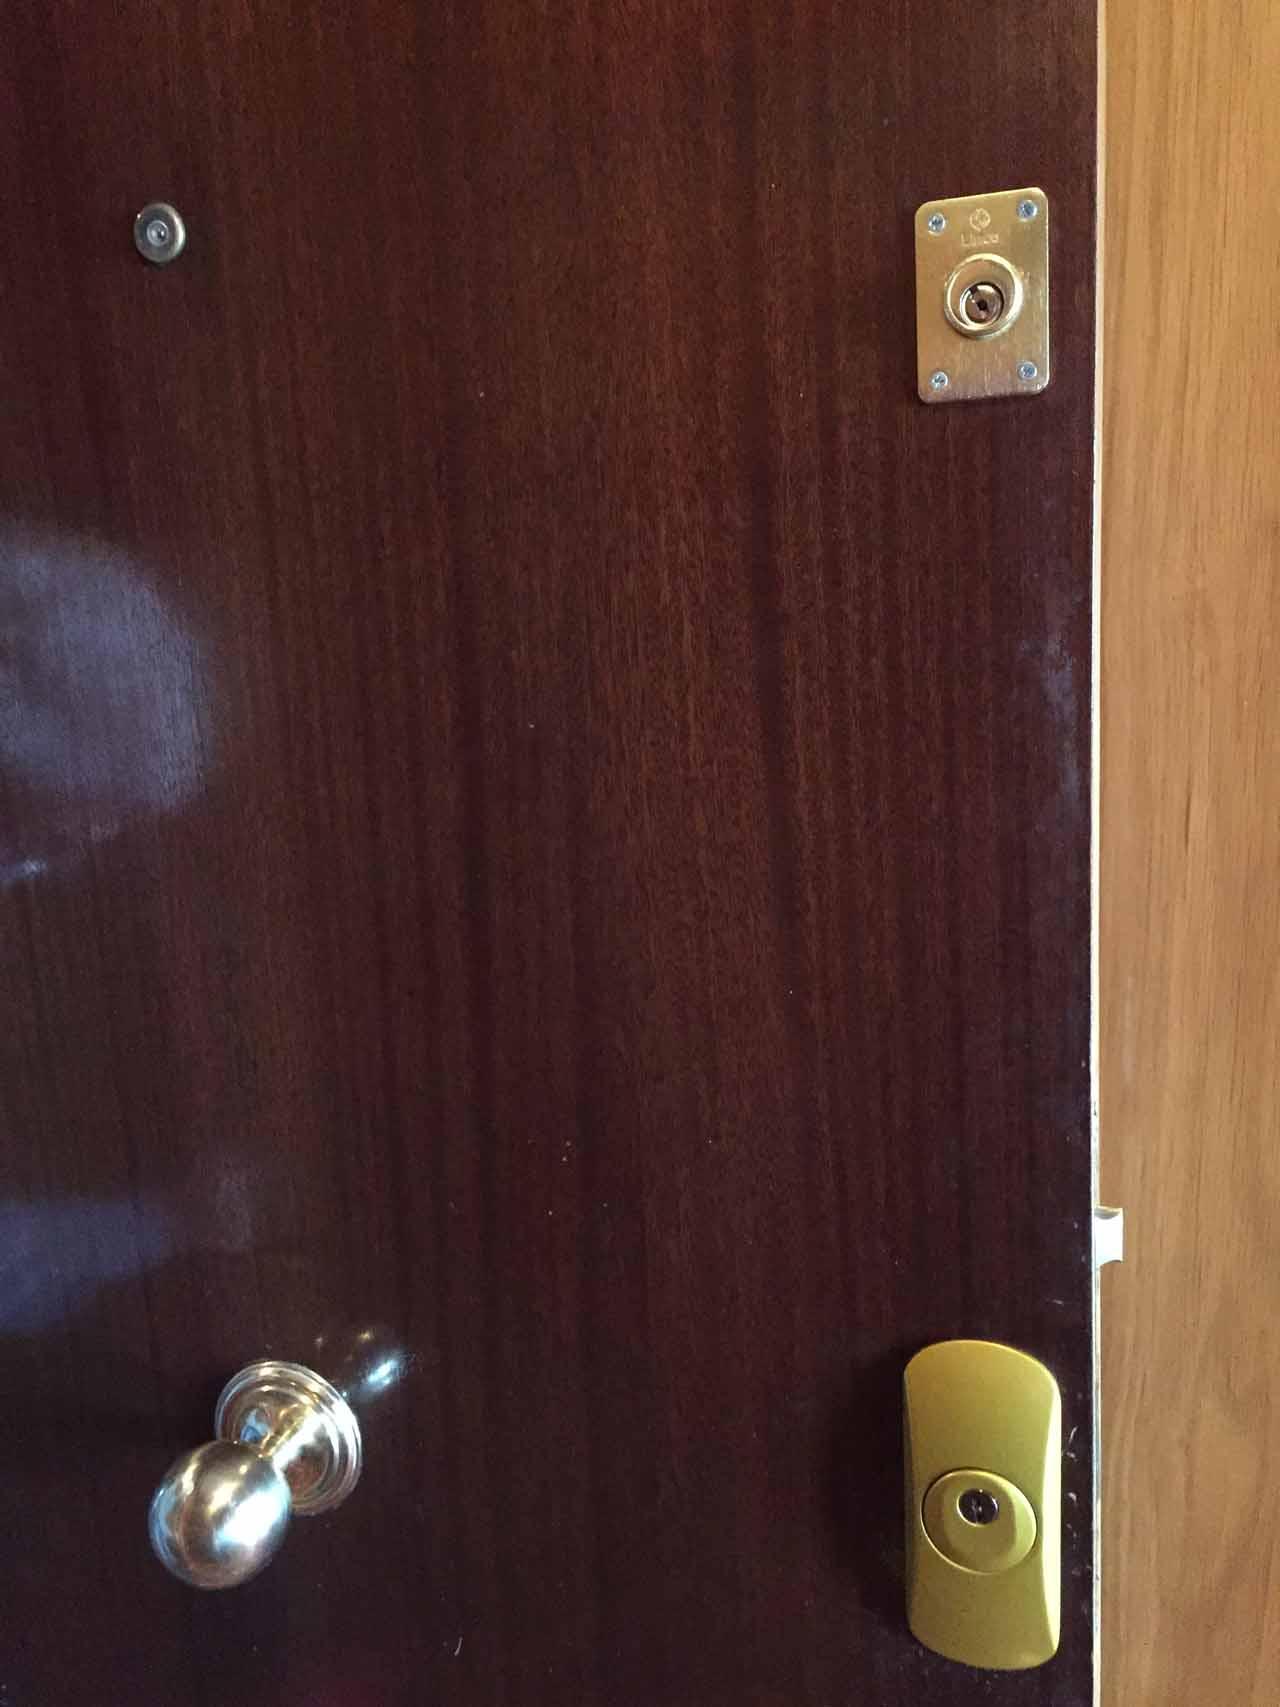 Cerraduras auxiliares fac madrid for Cerrajeros de urgencias madrid